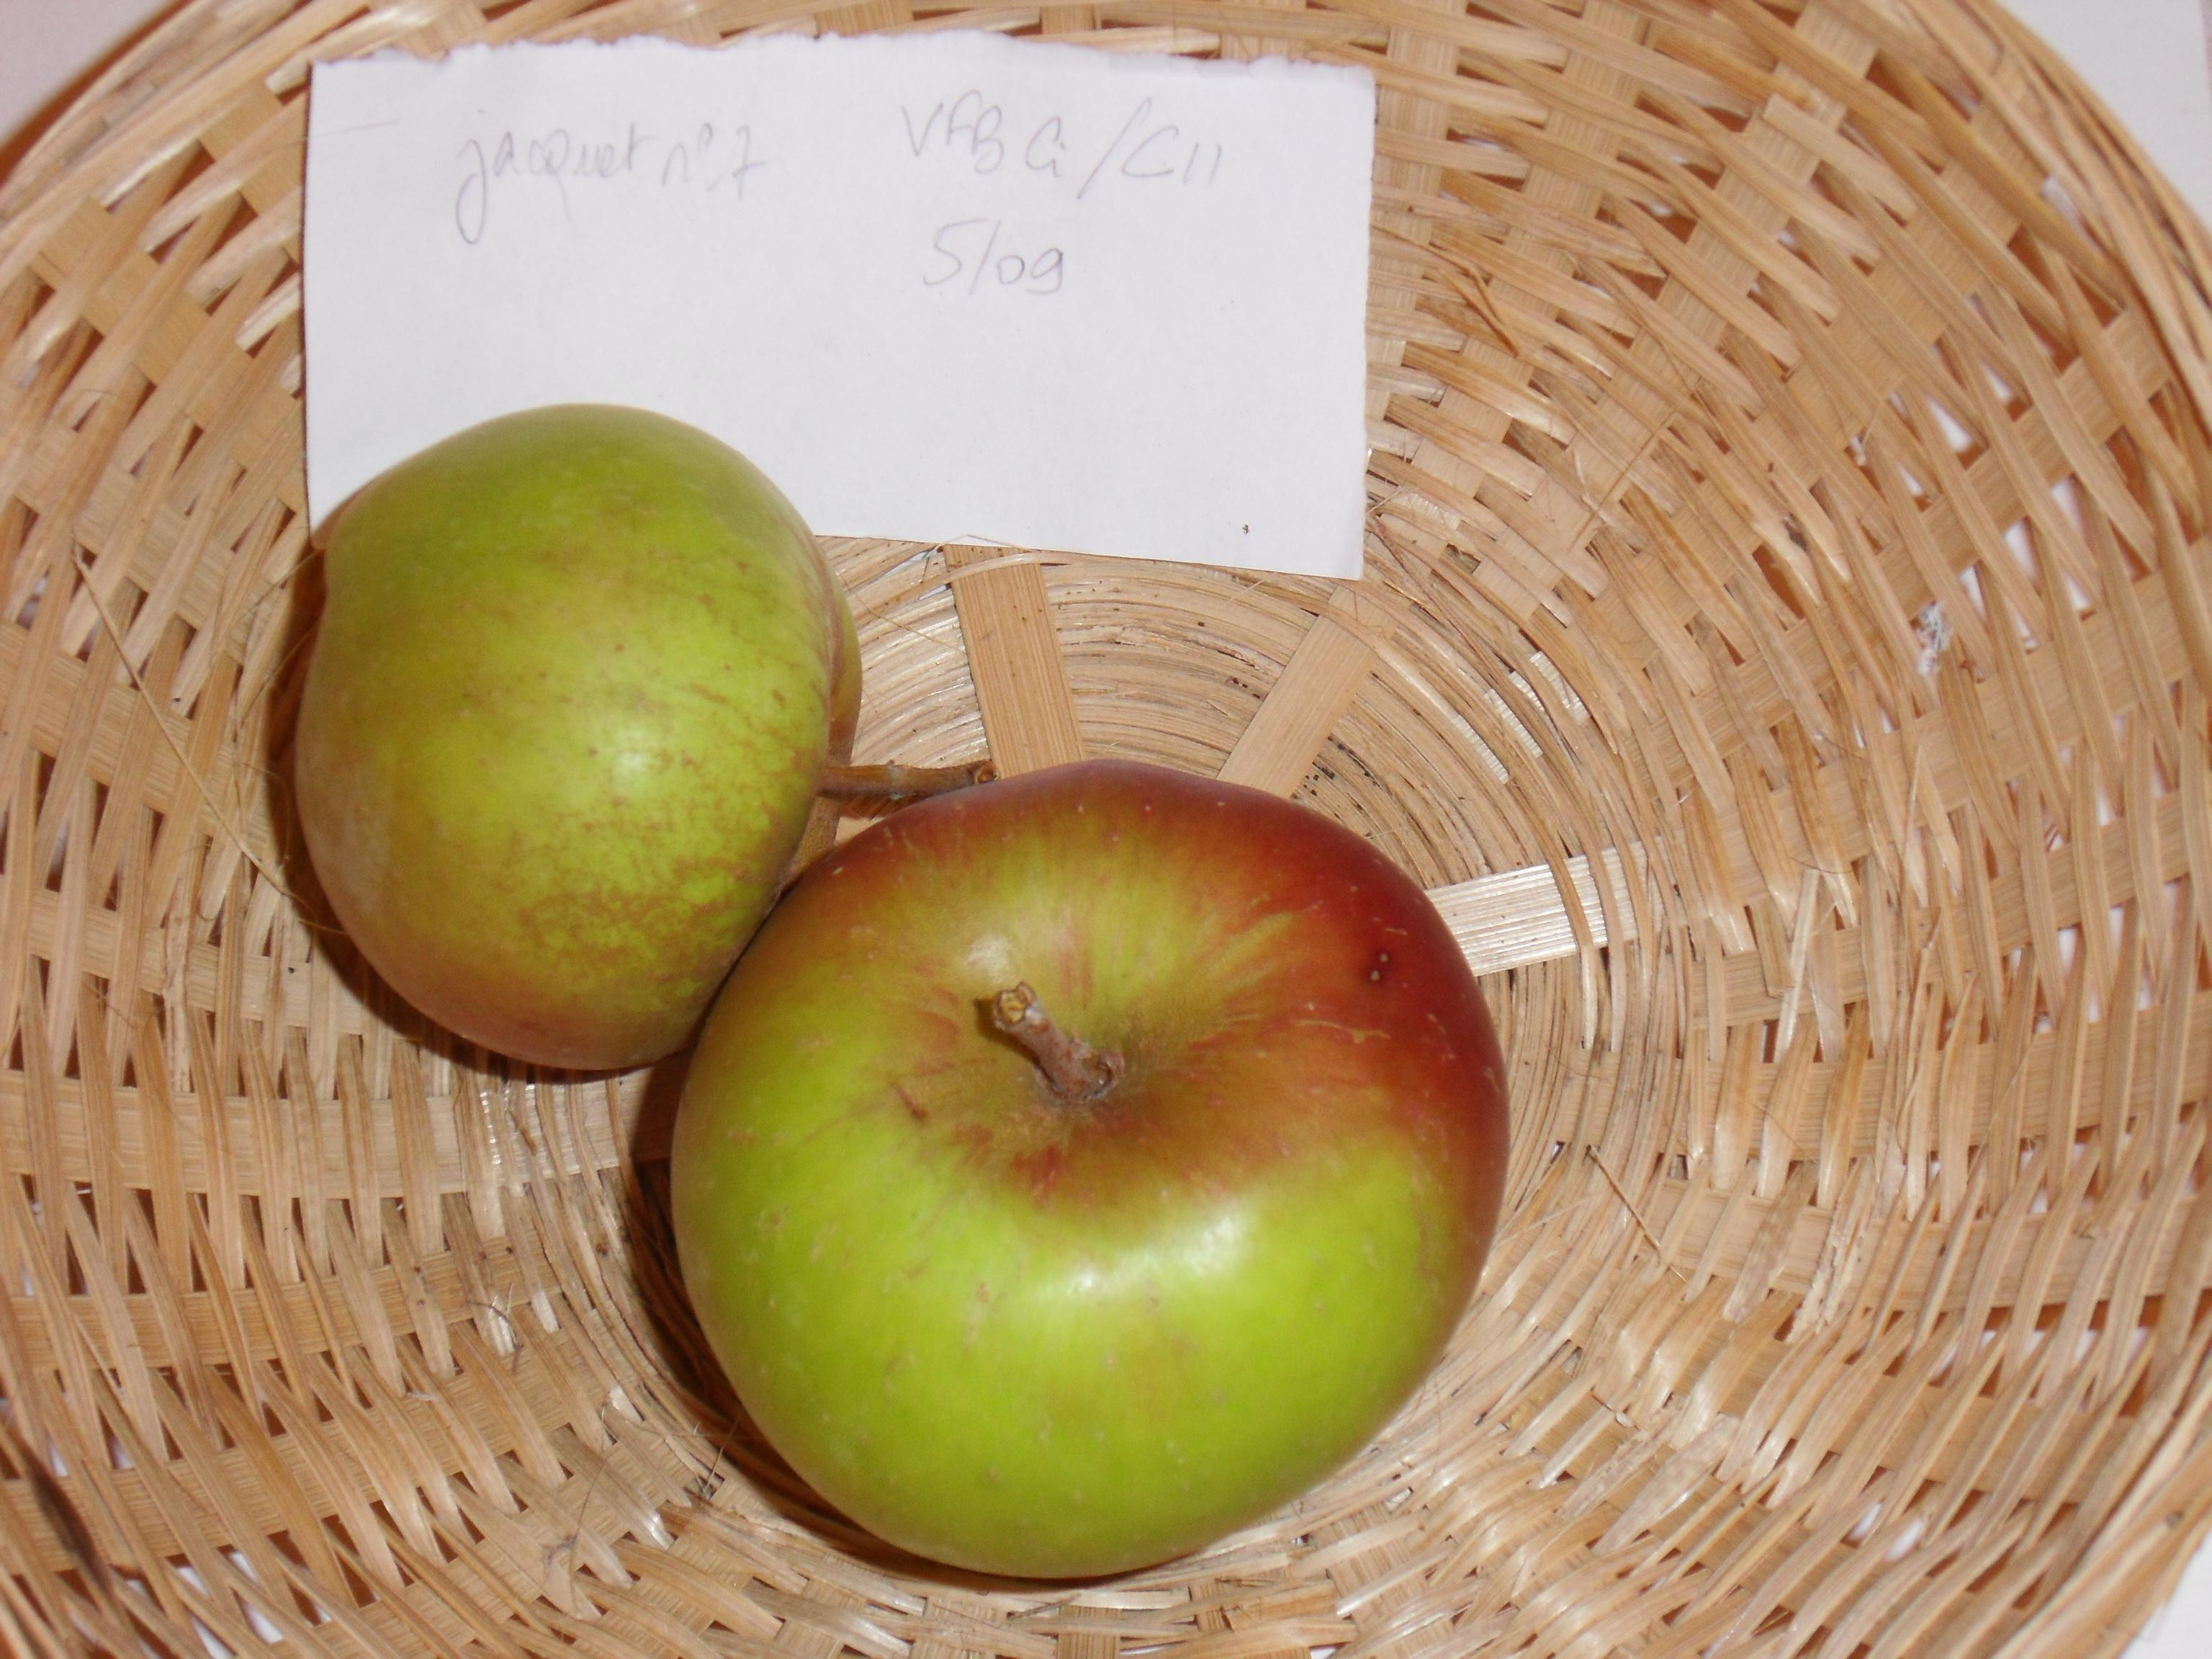 Jacquet n°7 (fruit).